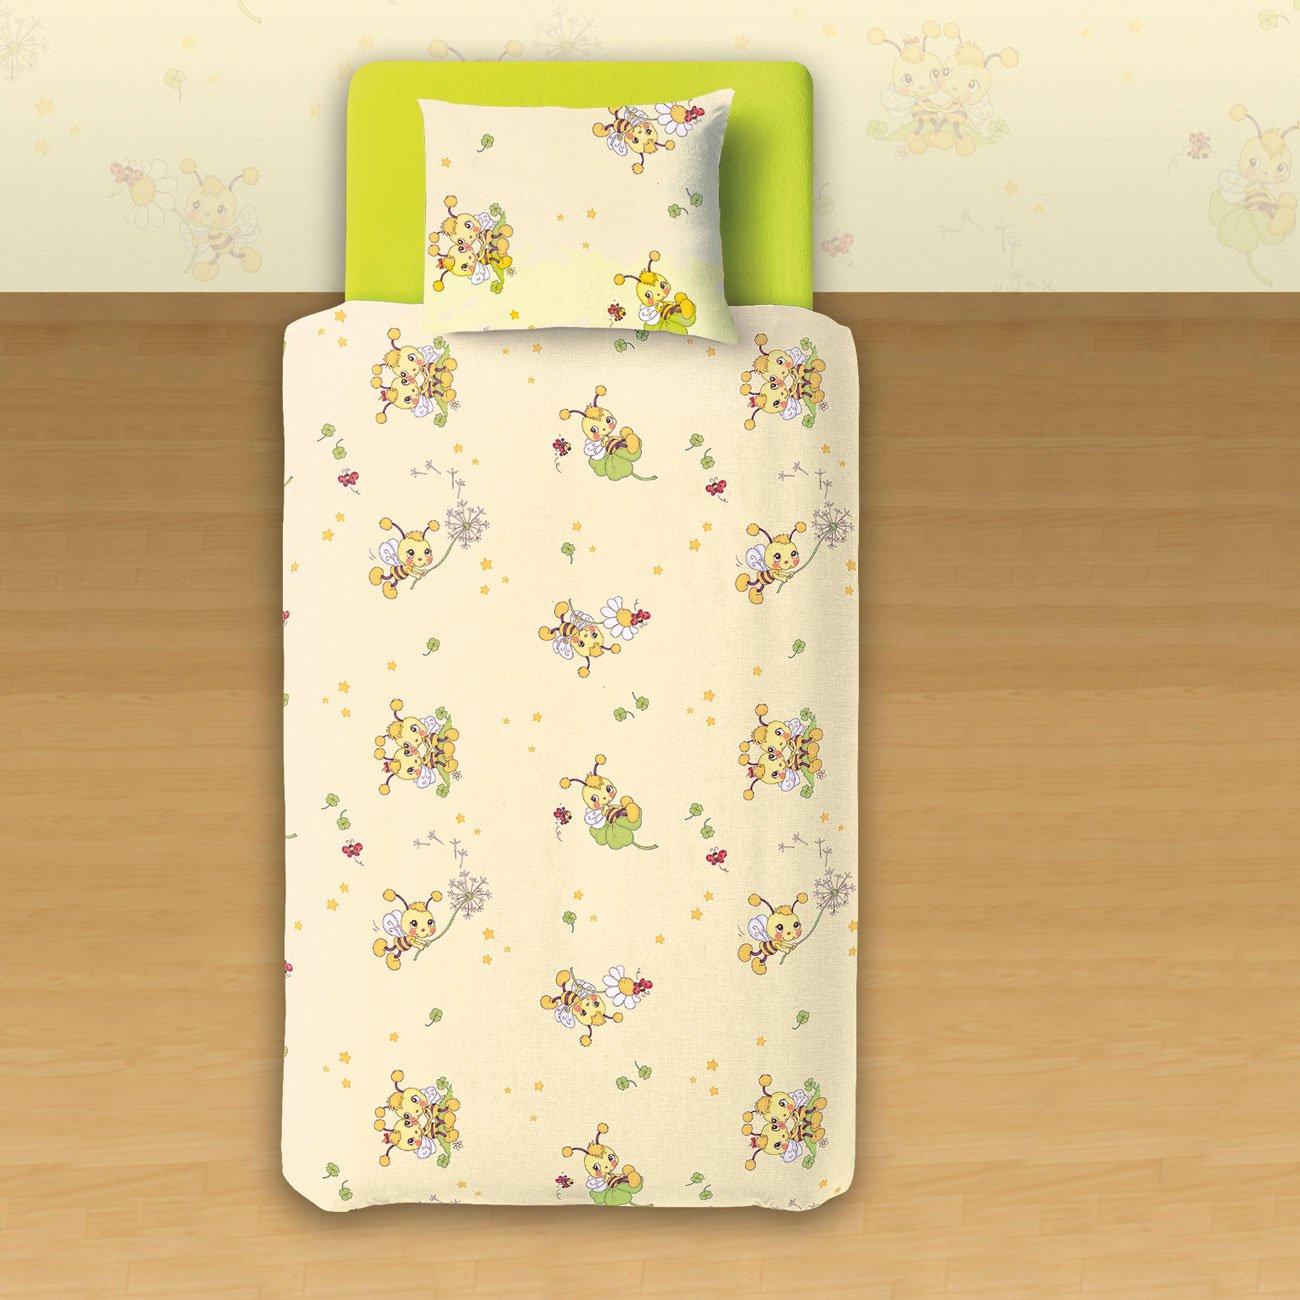 Baby Happy Bees – SoulBedroom 100% Cotton Bed Set (Duvet Cover 39''x 55'' cm & Pillow Case 15''x 23'' cm)